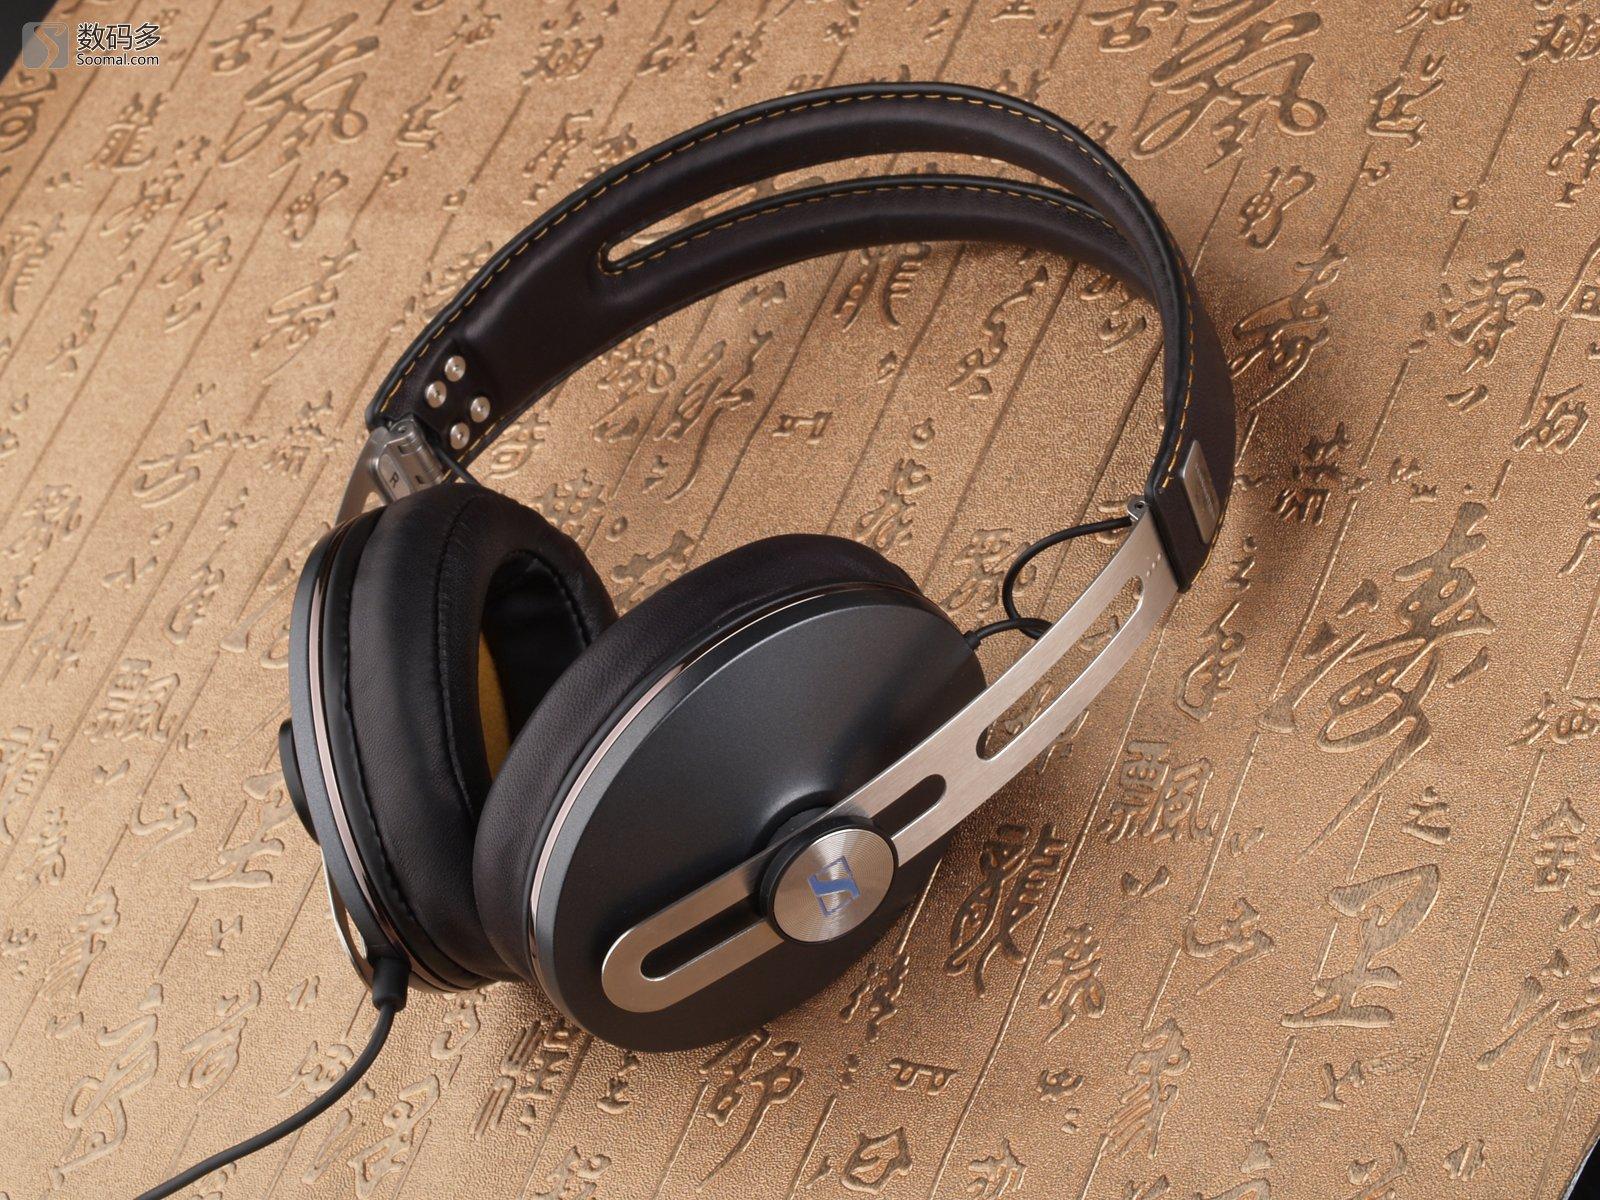 sennheiser 森海塞尔 momentum 2.0[大馒头] 头戴式耳机图片